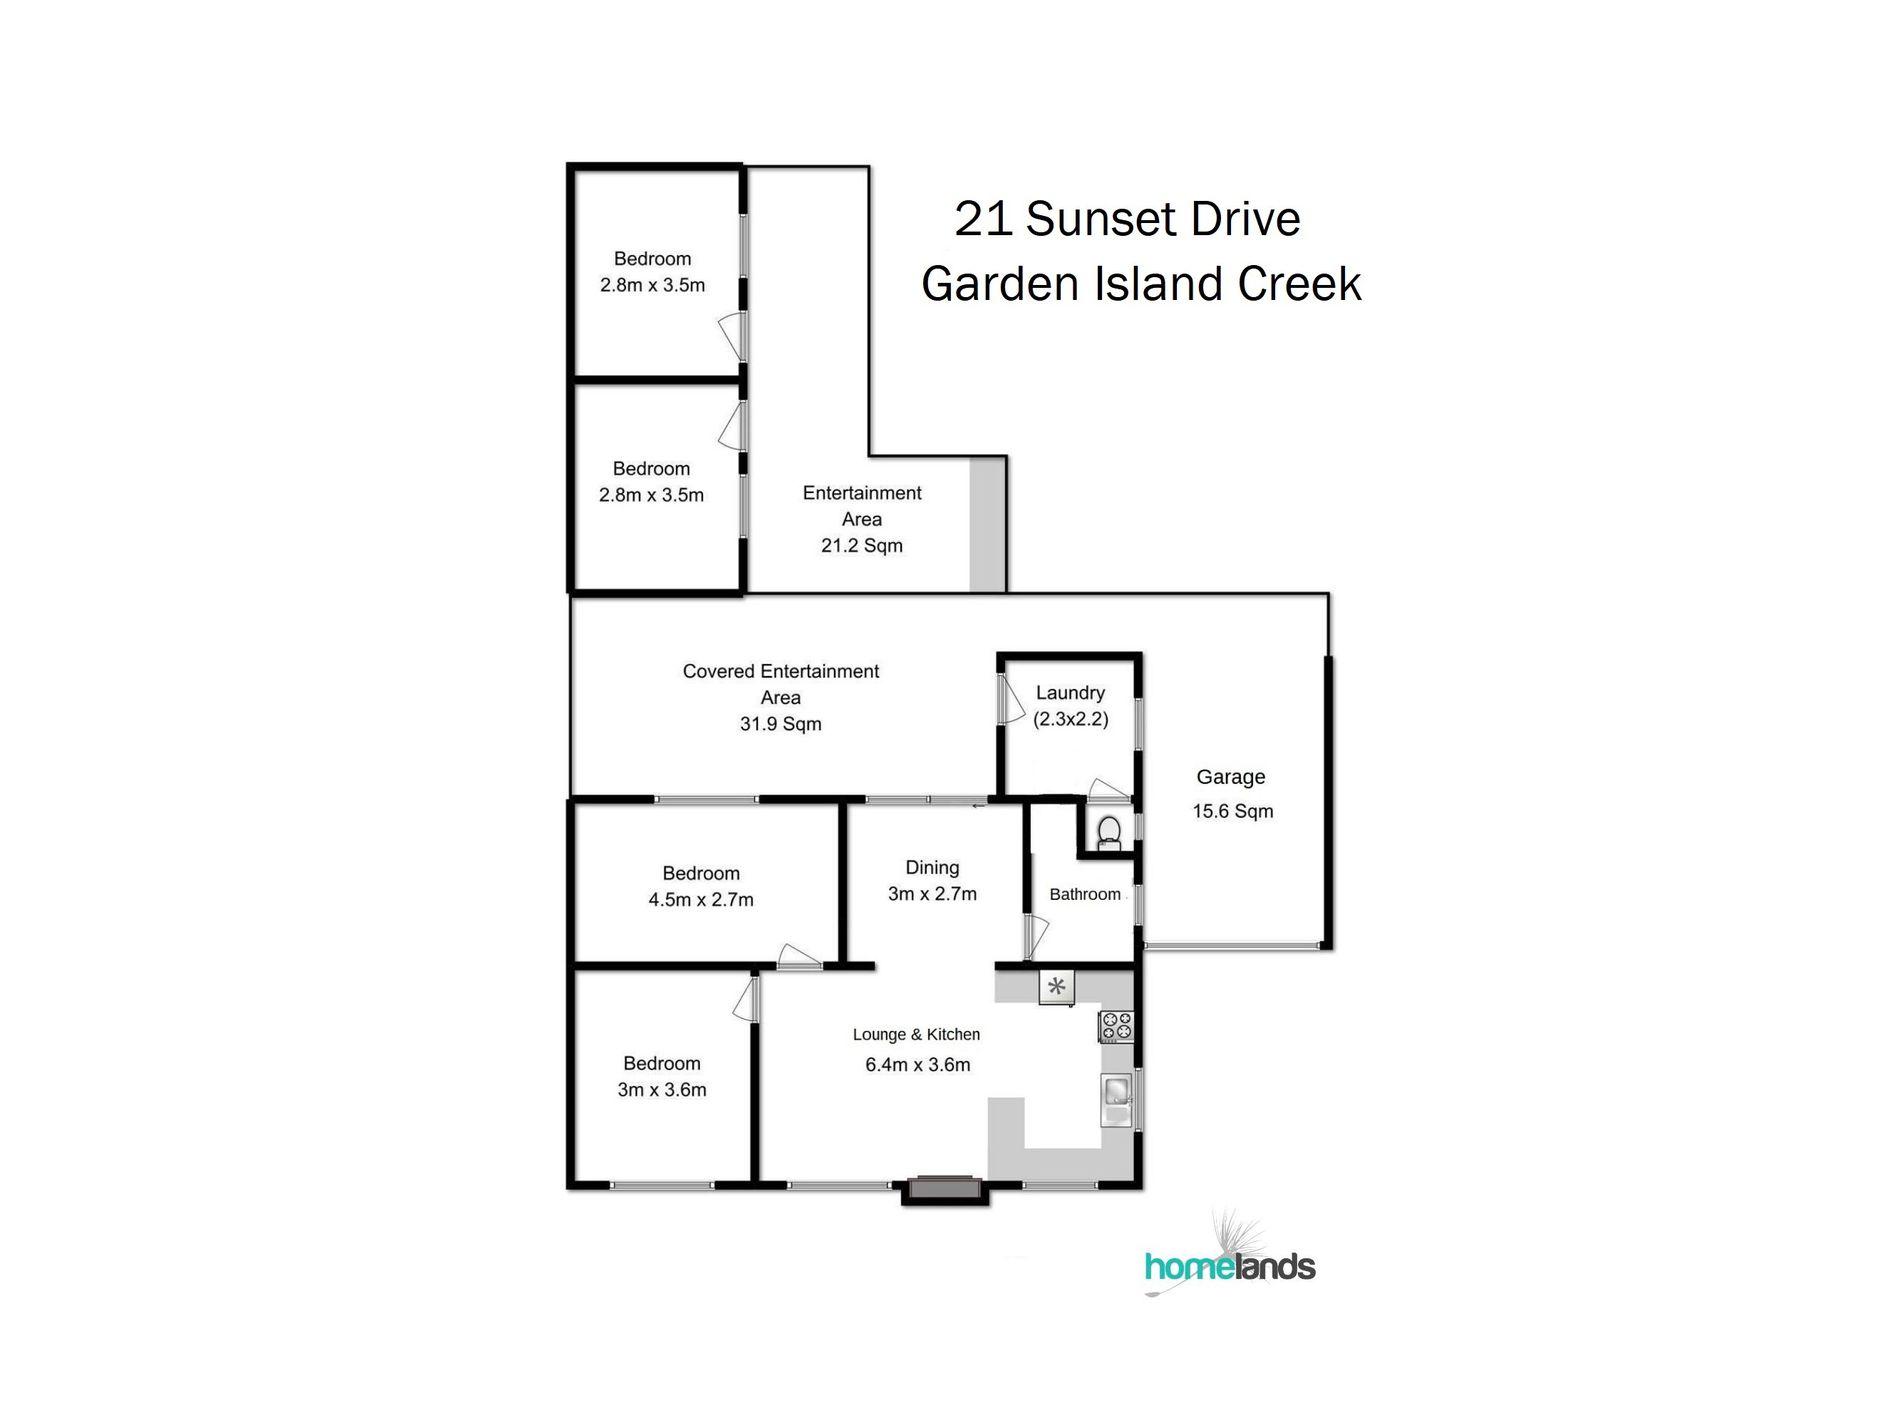 21 Sunset Drive, Garden Island Creek